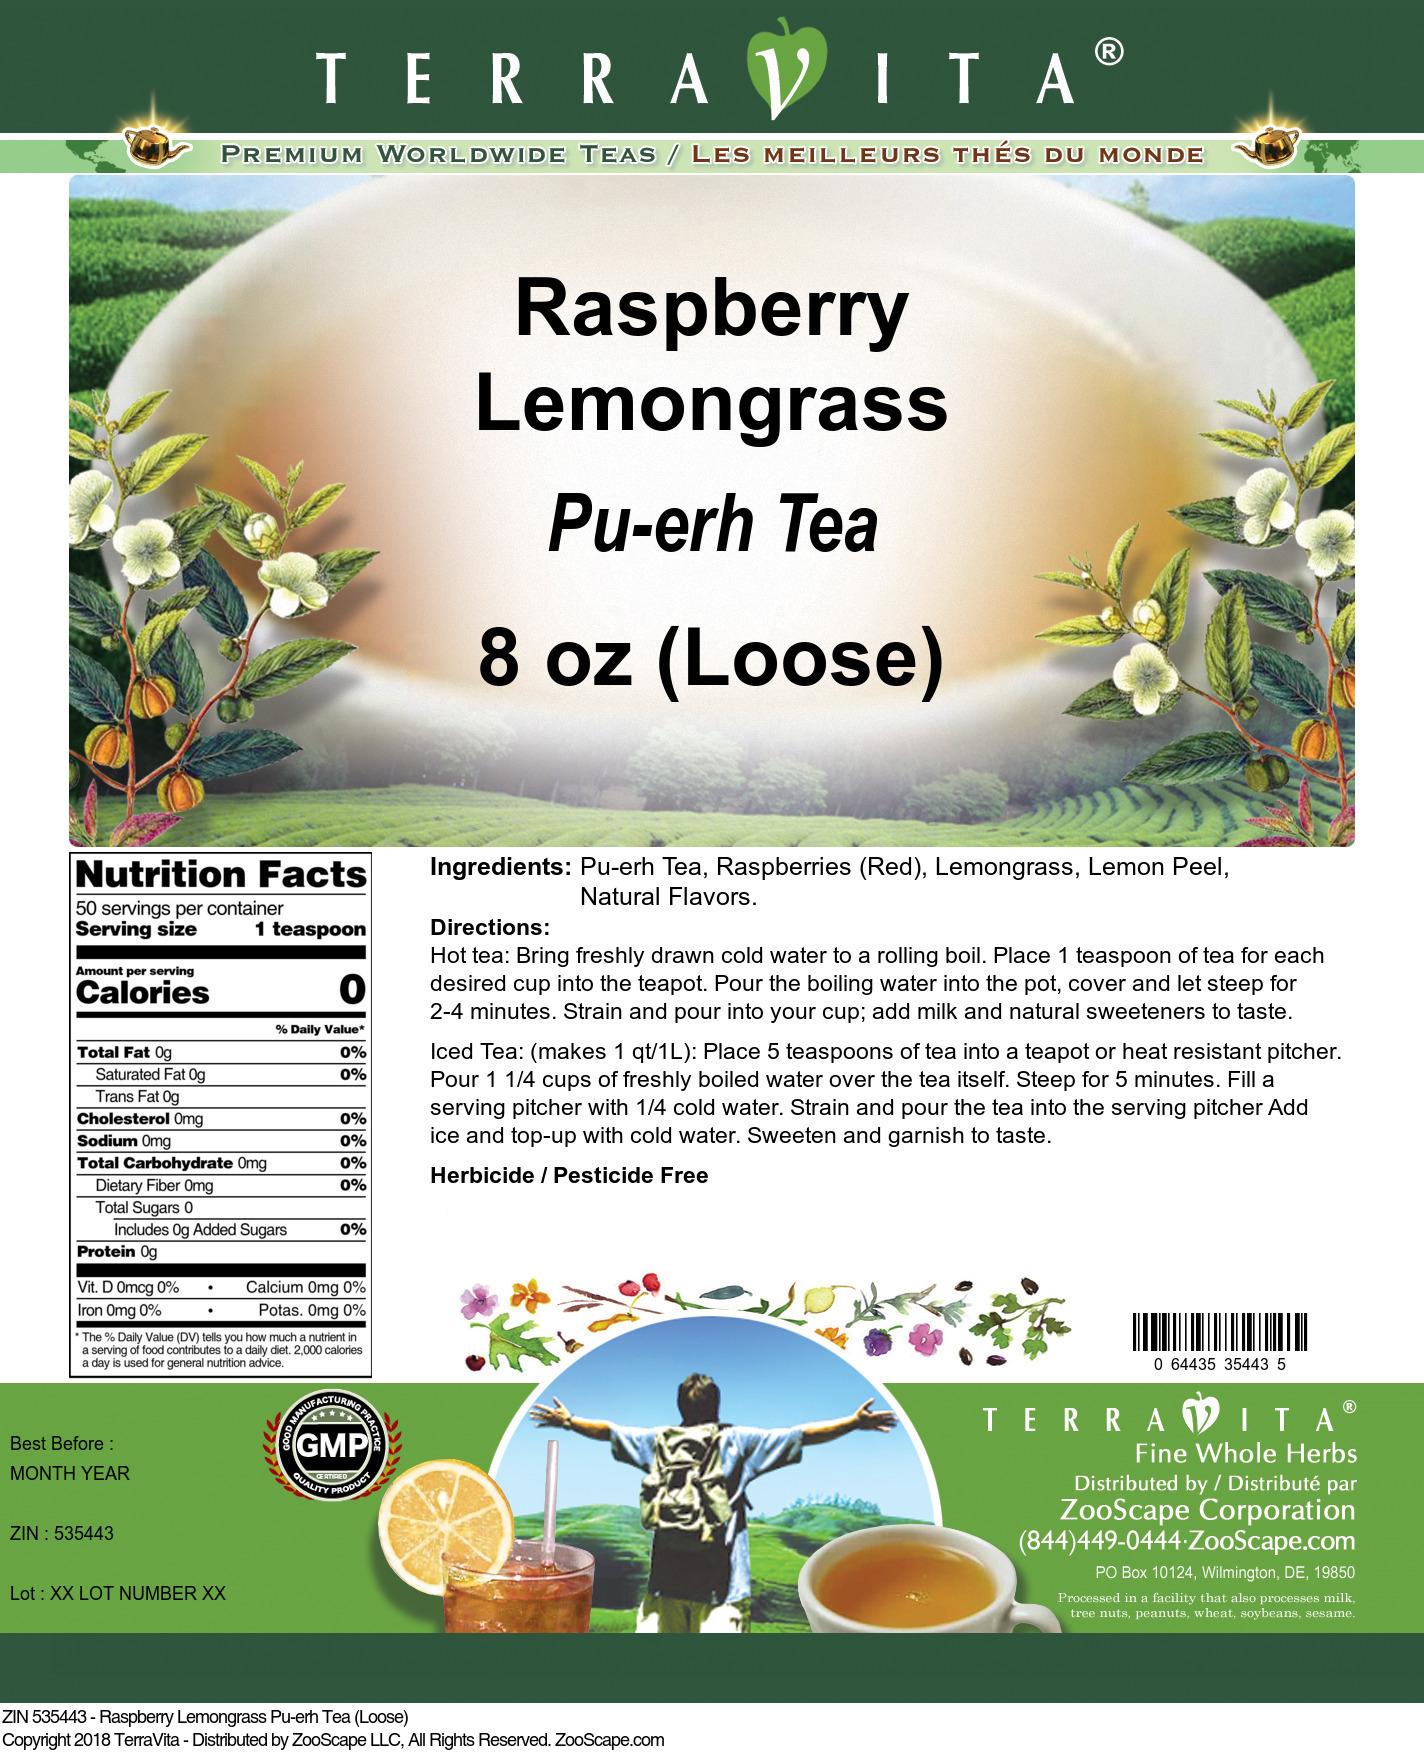 Raspberry Lemongrass Pu-erh Tea (Loose)